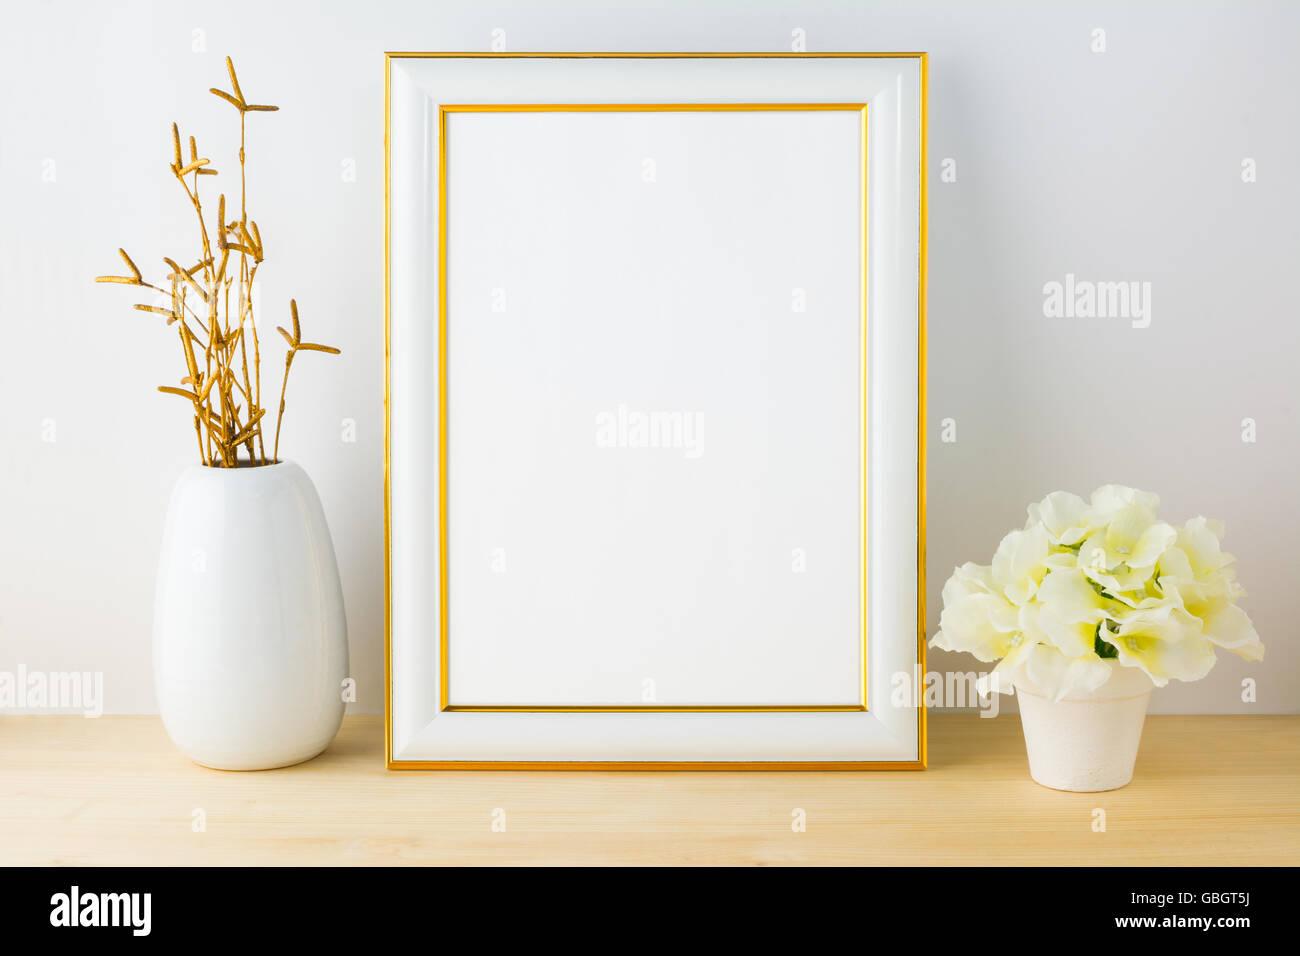 69c1c952d8fd Frame mockup with white flowerpot. Frame mockup. Poster Mockup. Styled  mockup. Portrait frame mockup. Product mockup. Design Mo